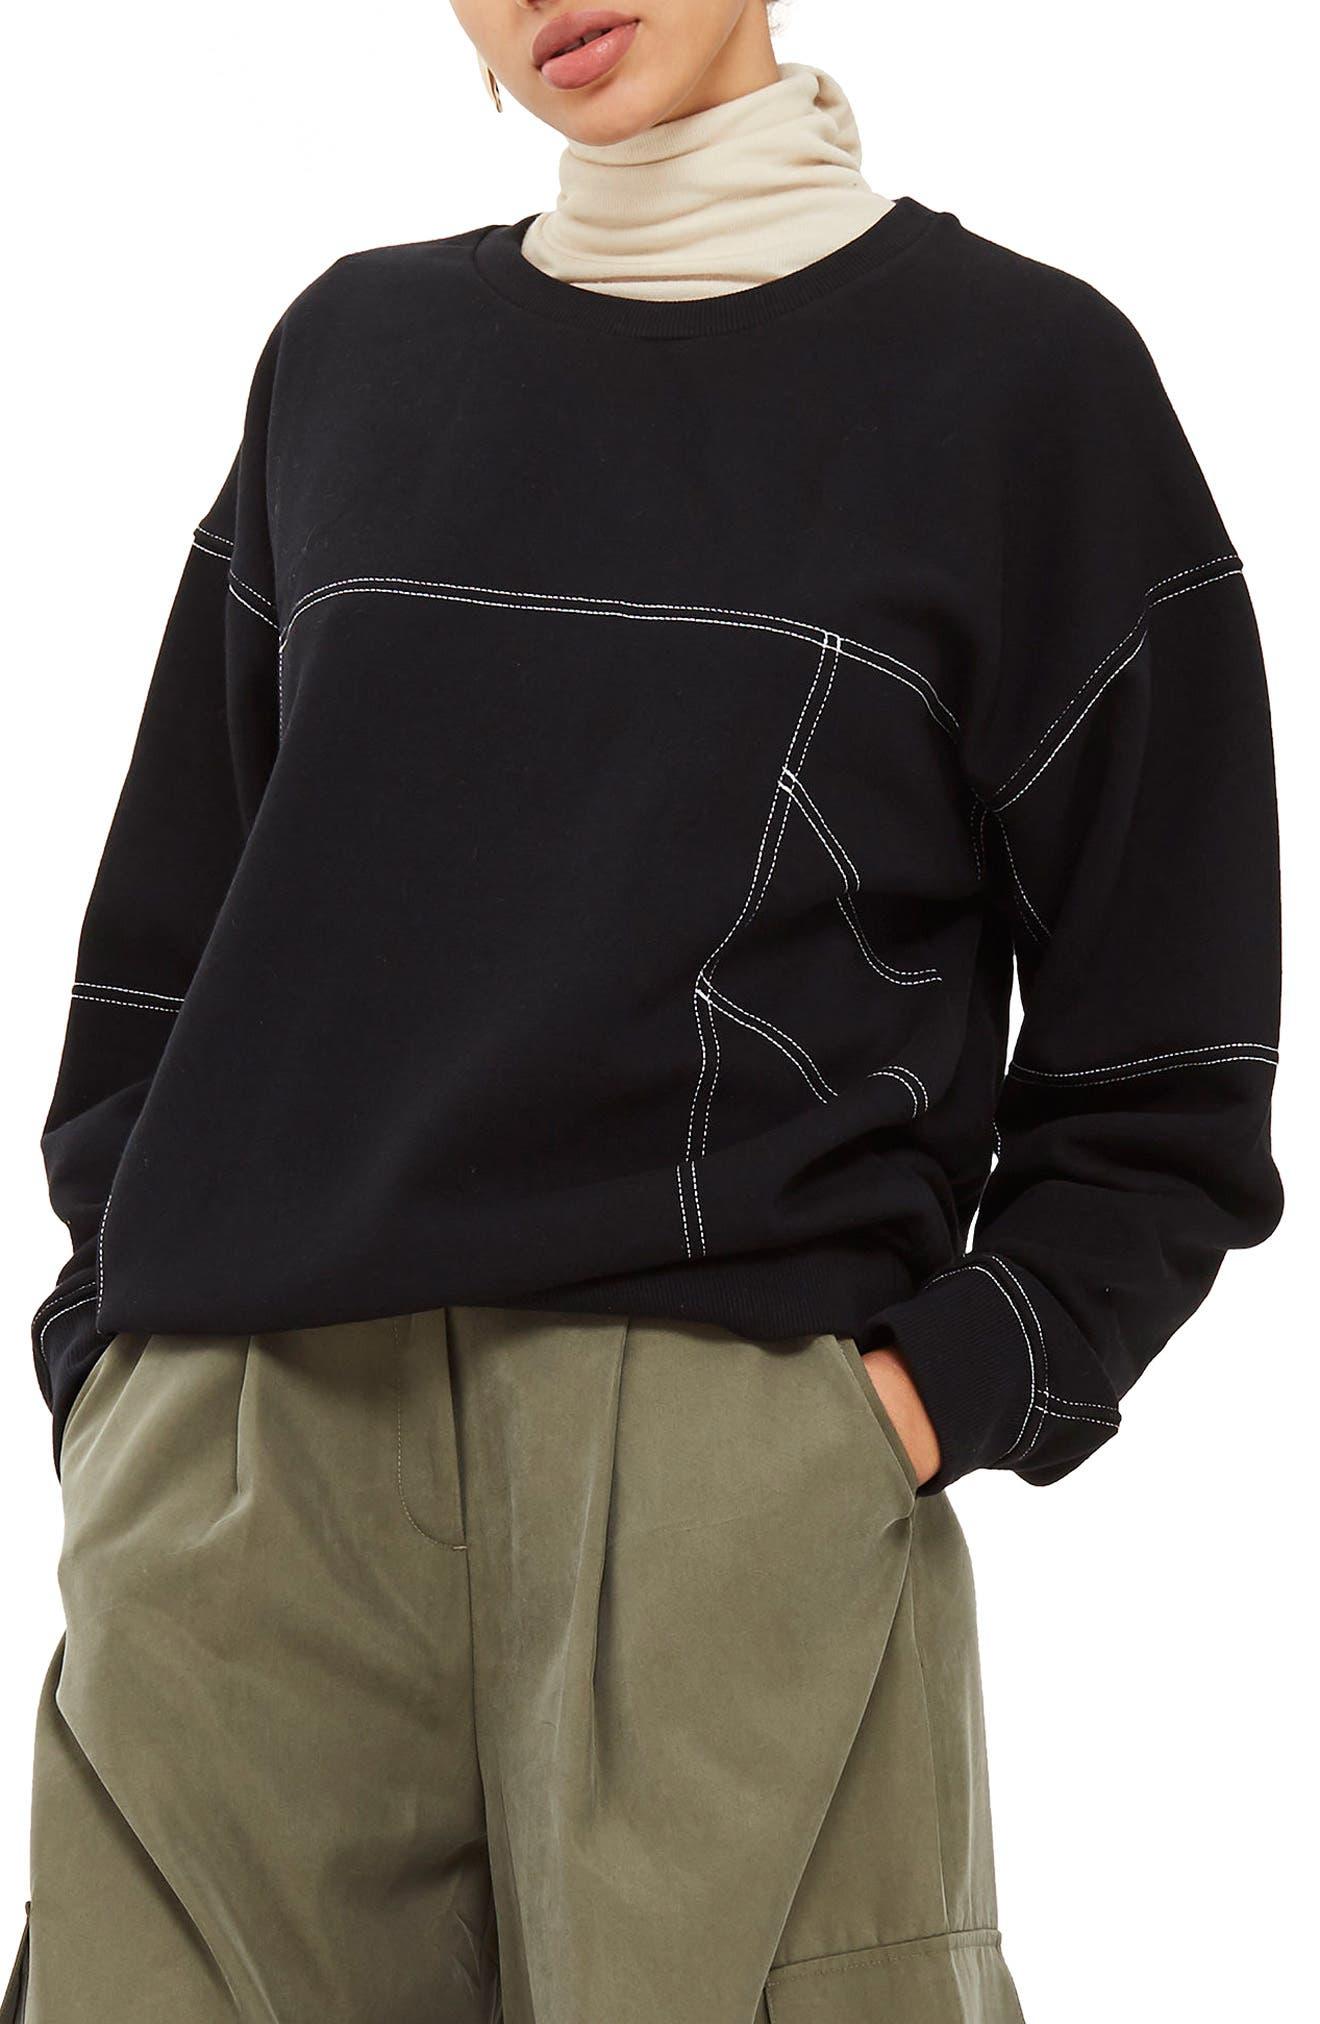 Stab Stitch Detail Sweatshirt,                             Main thumbnail 1, color,                             Black